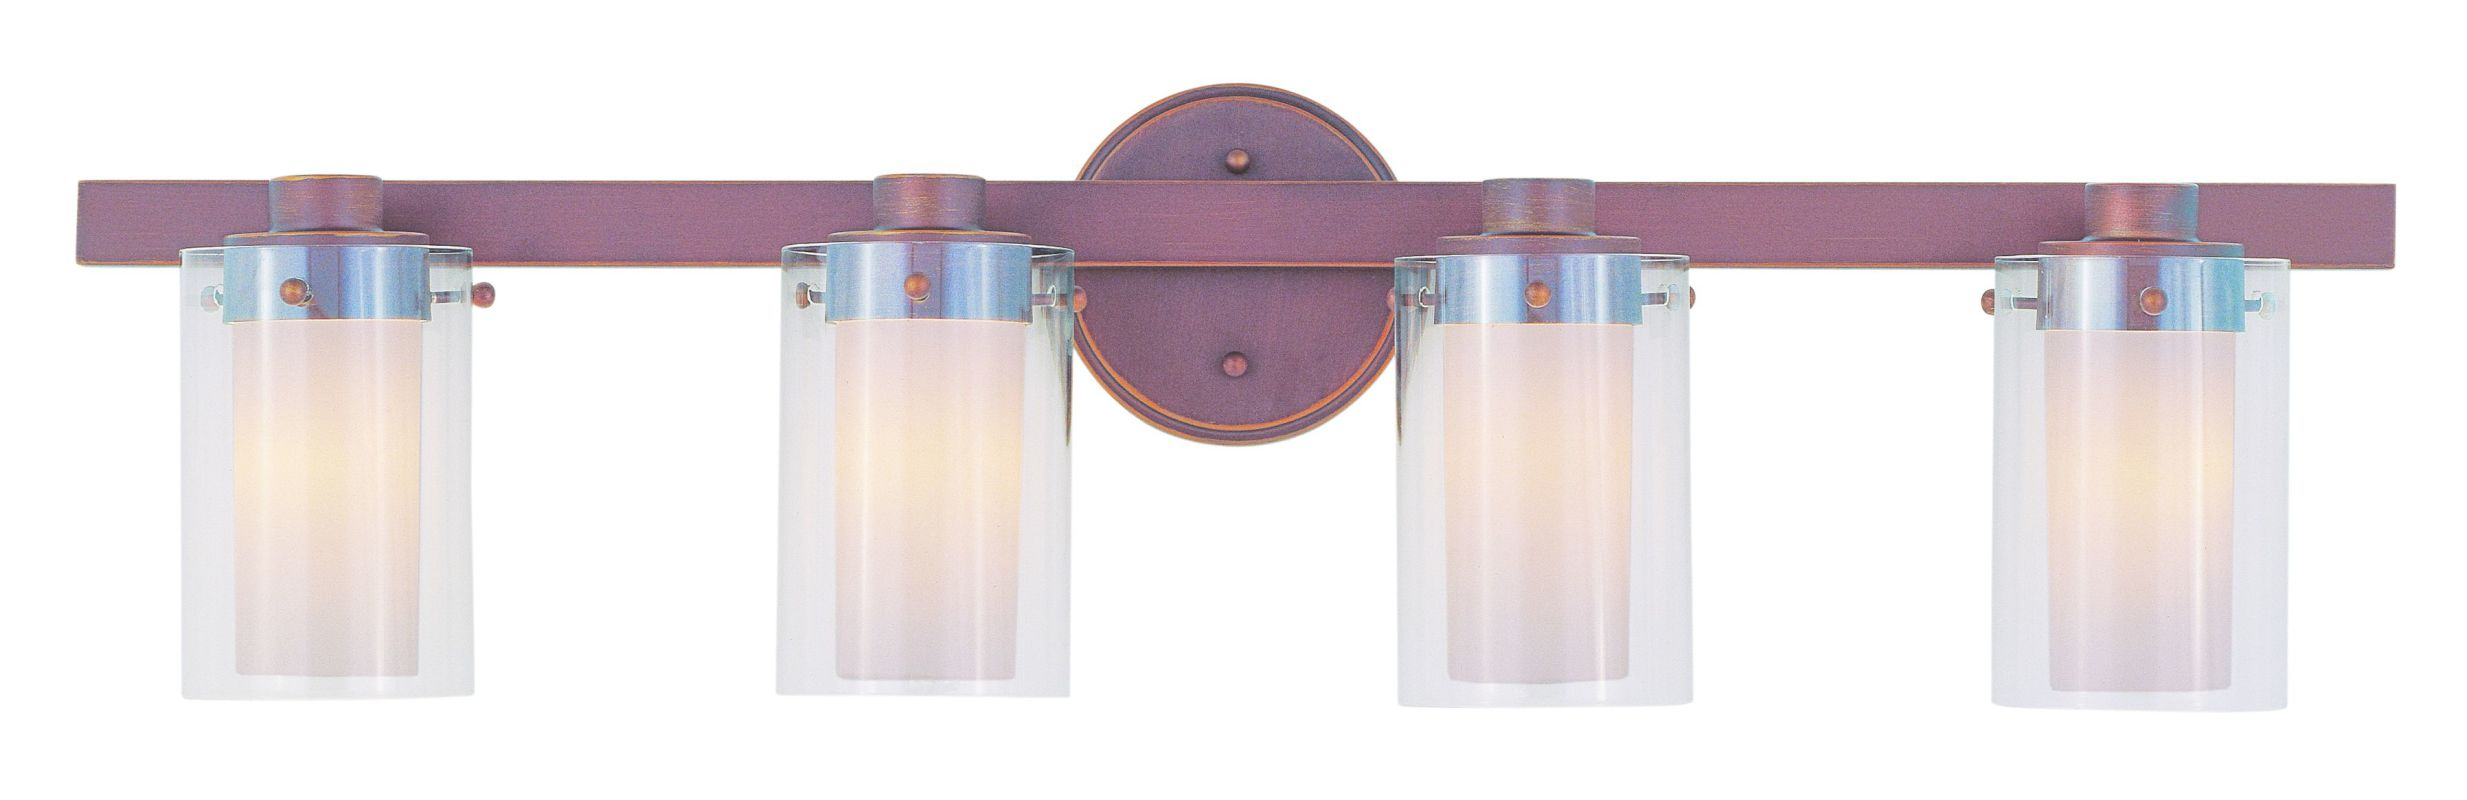 Livex Lighting 1544 Manhattan 4 Light Bathroom Vanity Light Vintage